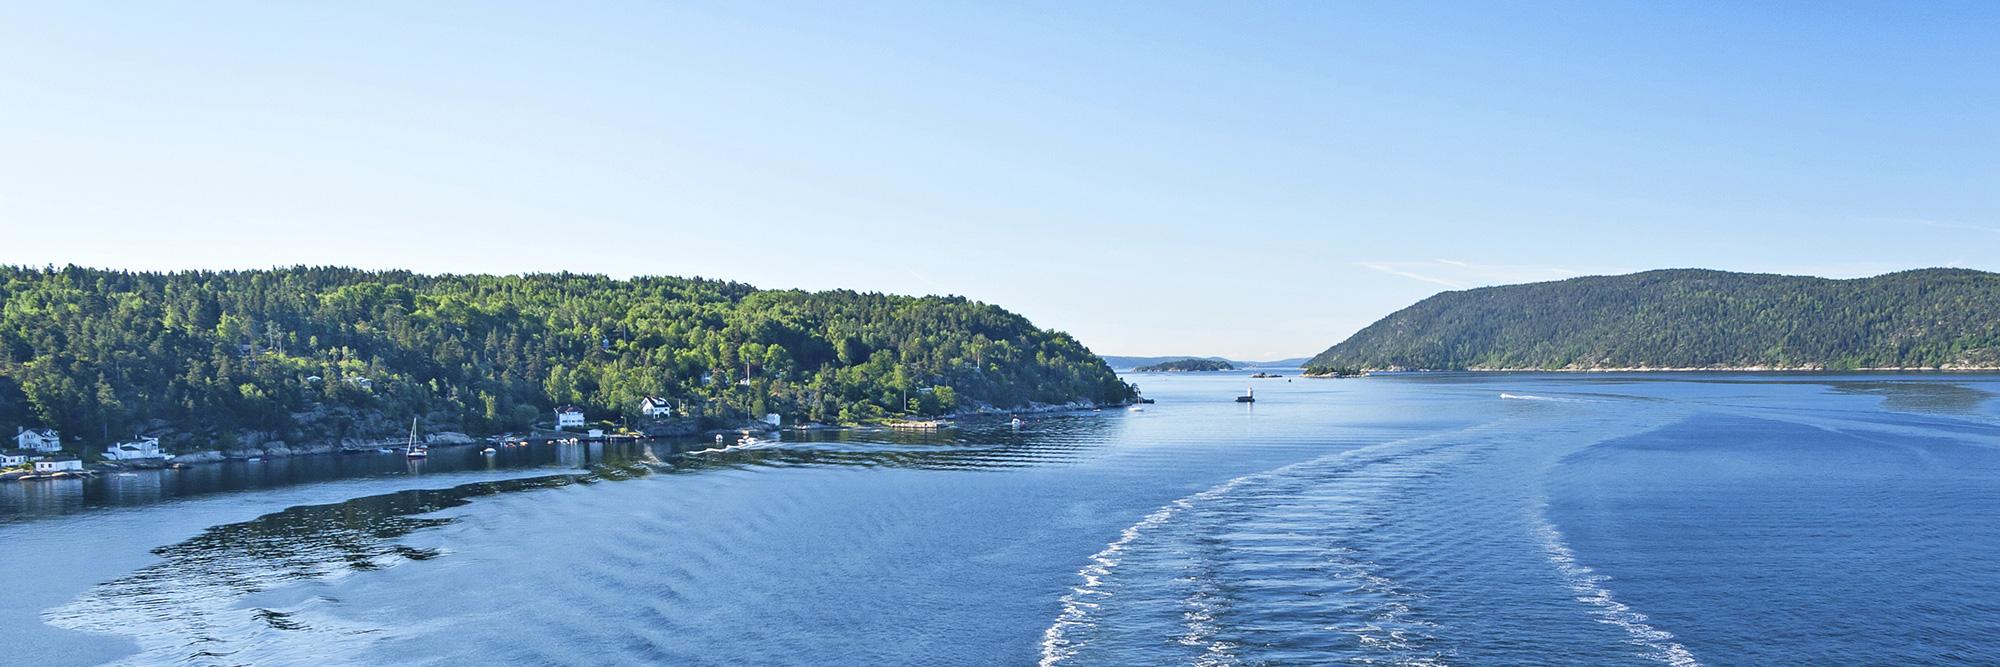 Le fjord d'Oslo en Zodiac